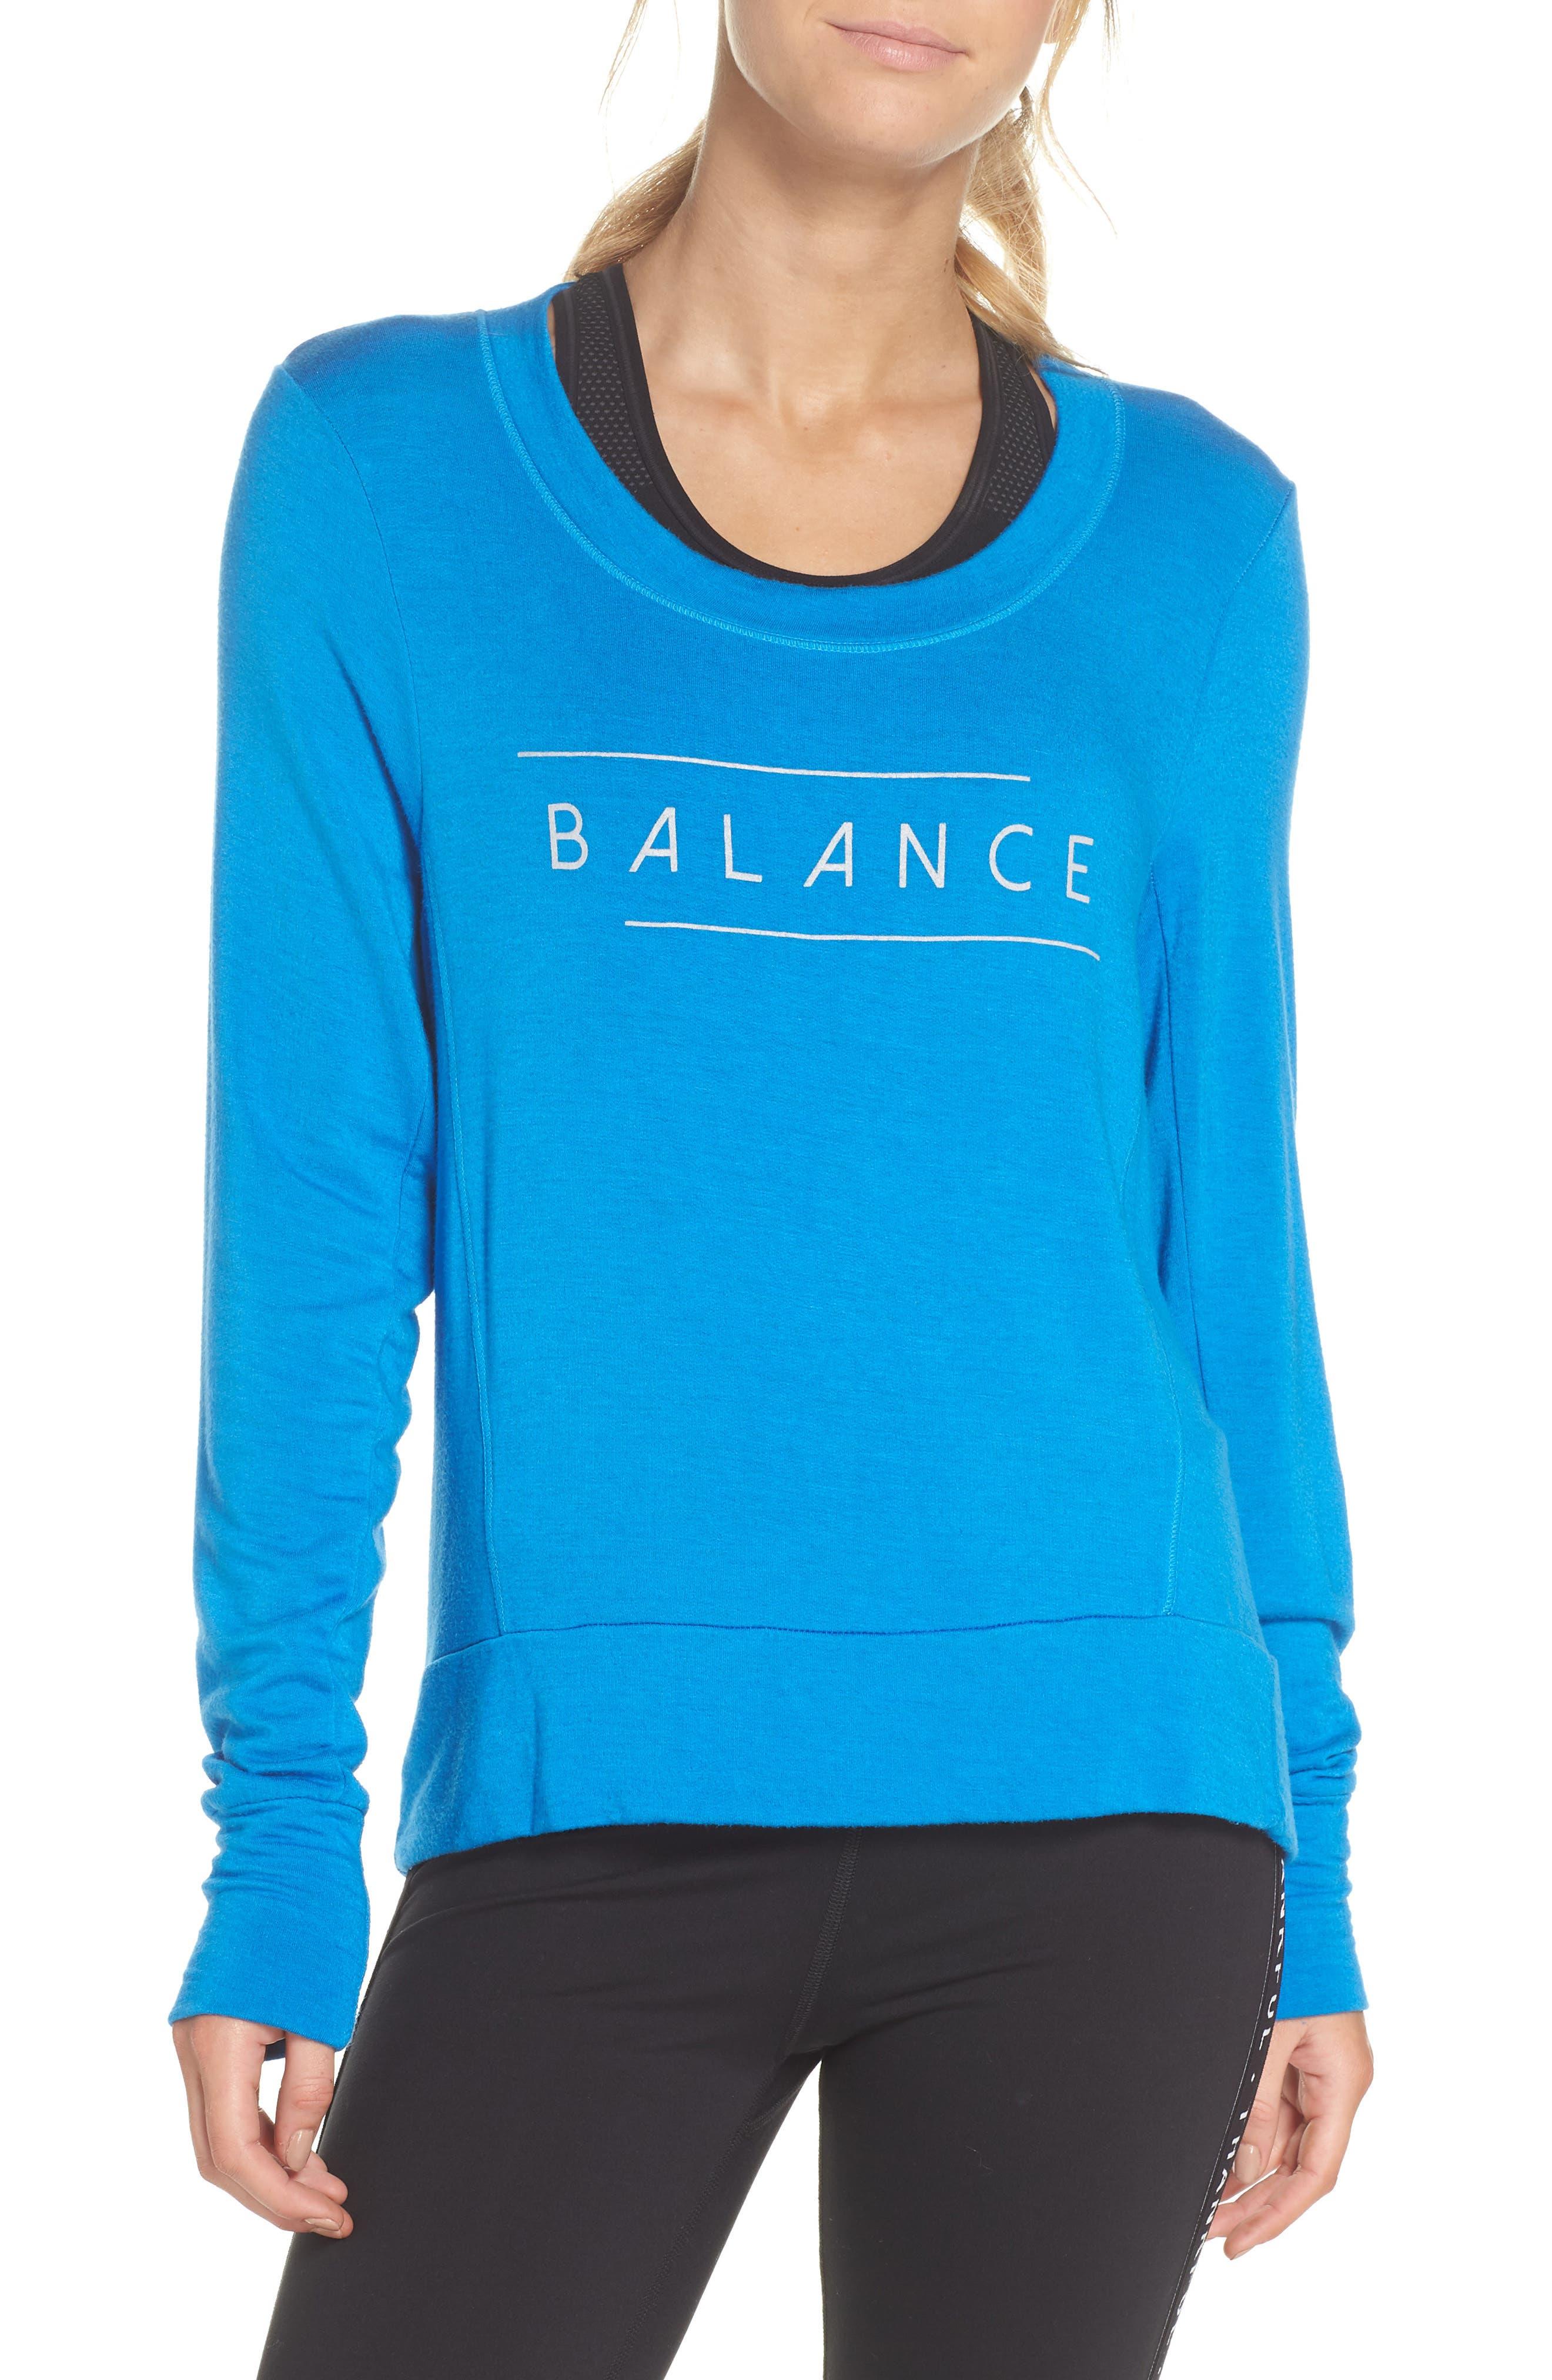 Good Hyouman Jules Balance Sweatshirt